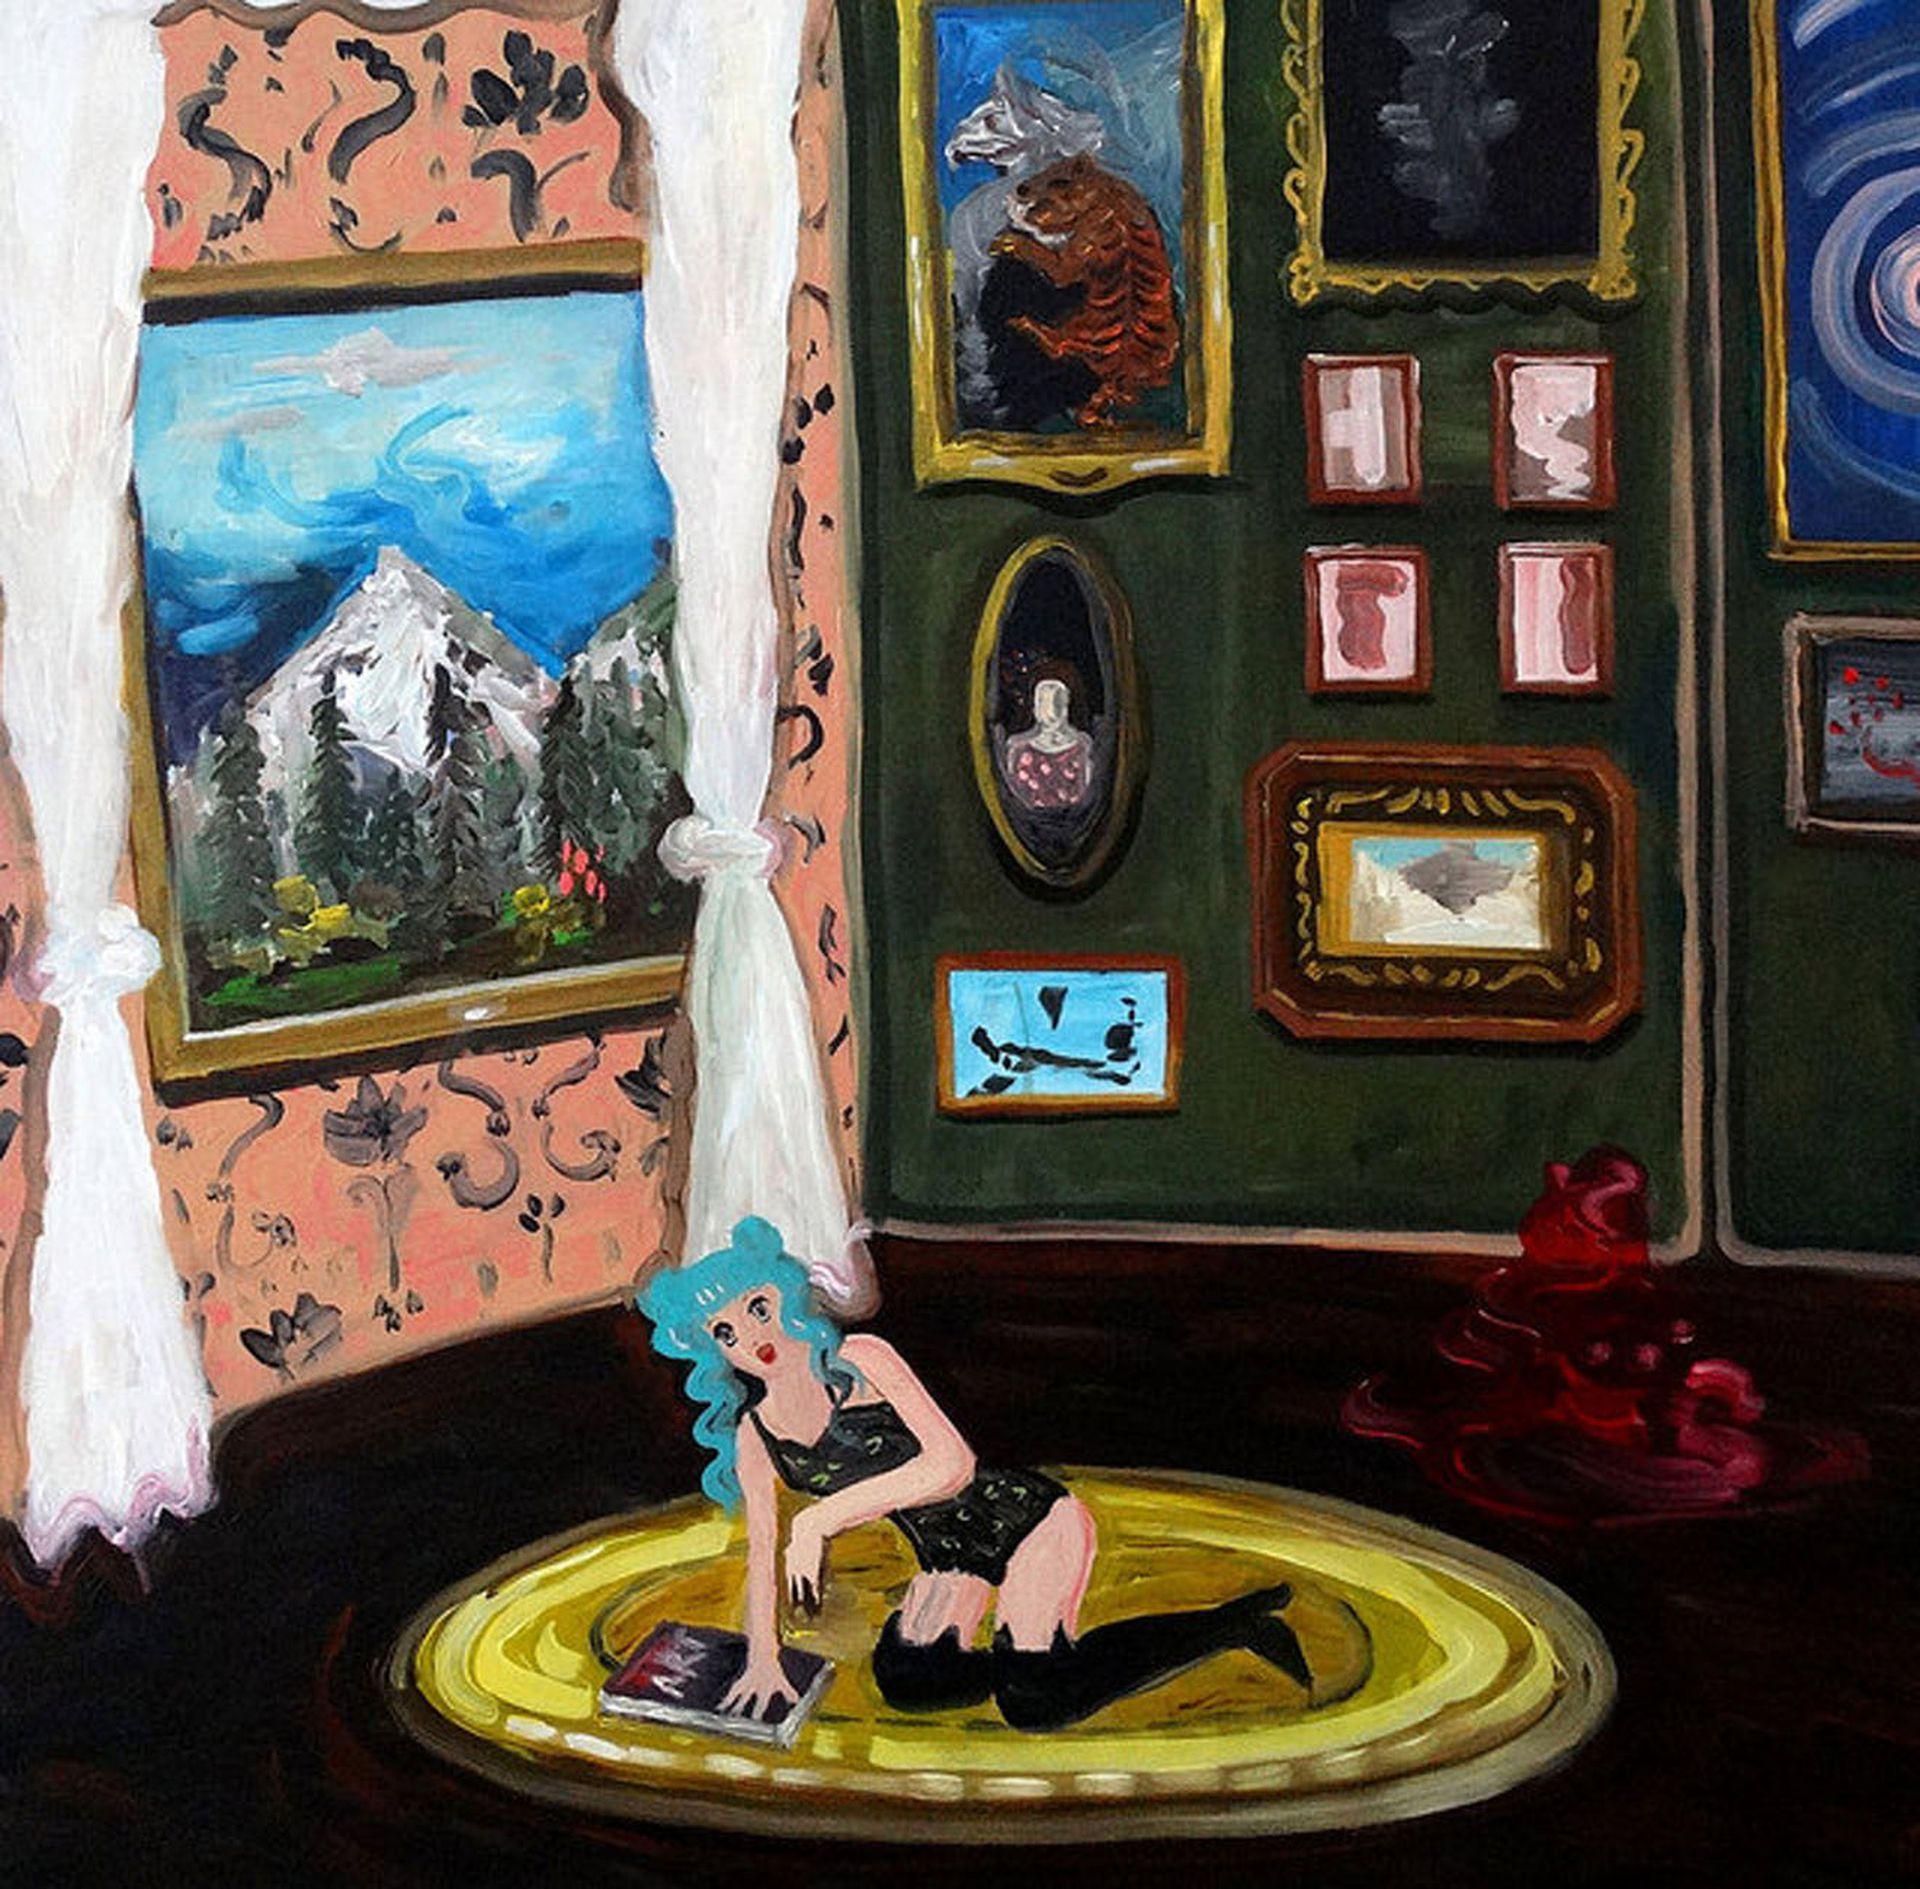 """Animé con ventana"" (2017), de Fátima Pecci Carou. Galería Piedras, sección Barrio Joven"